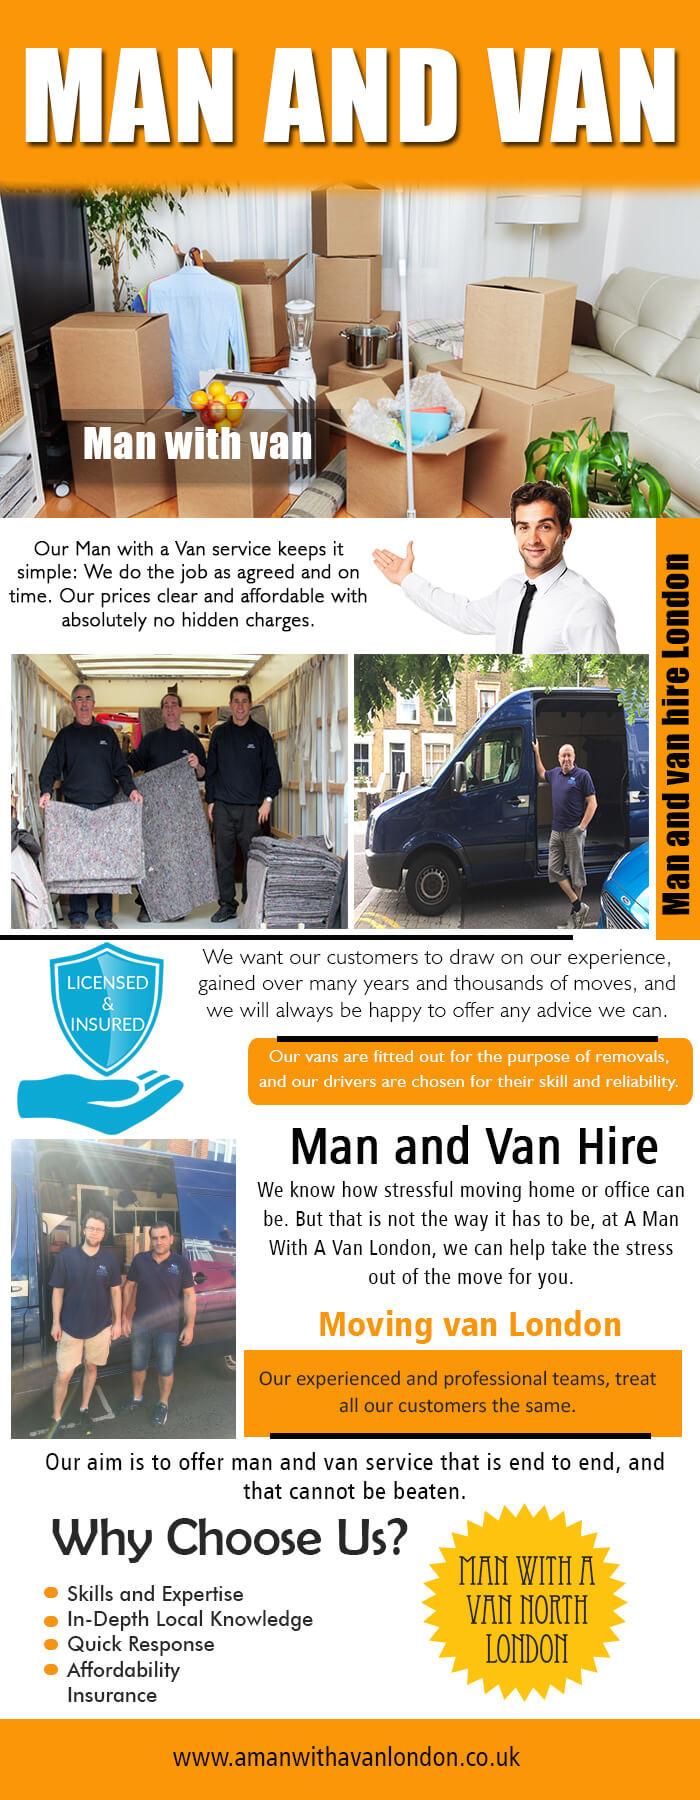 Man And Van London Online Vans